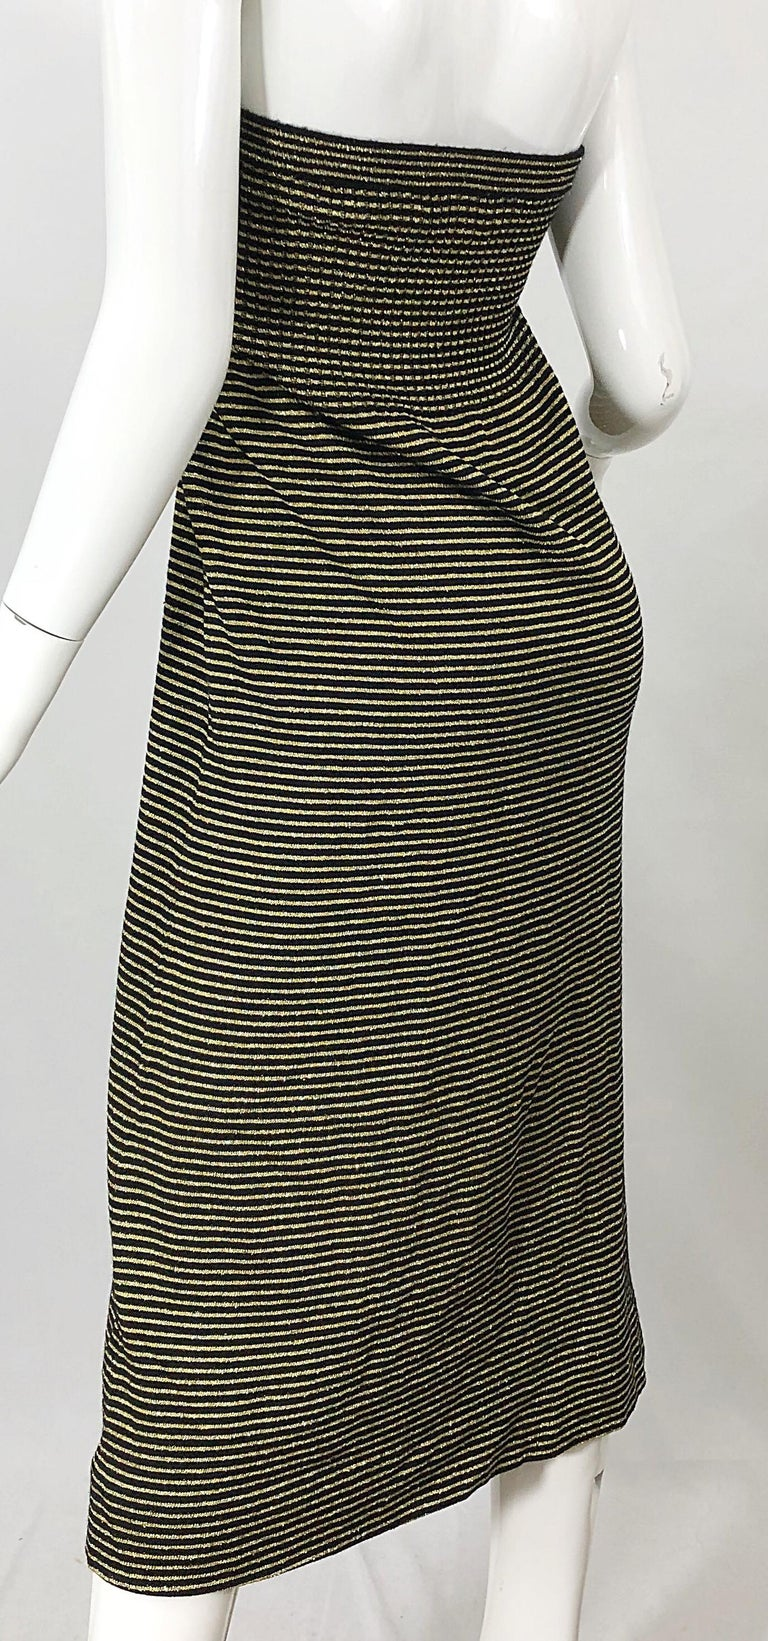 Vintage Yves Saint Laurent YSL 70s Gold Black Strapless Knit Dress or Maxi Skirt For Sale 6